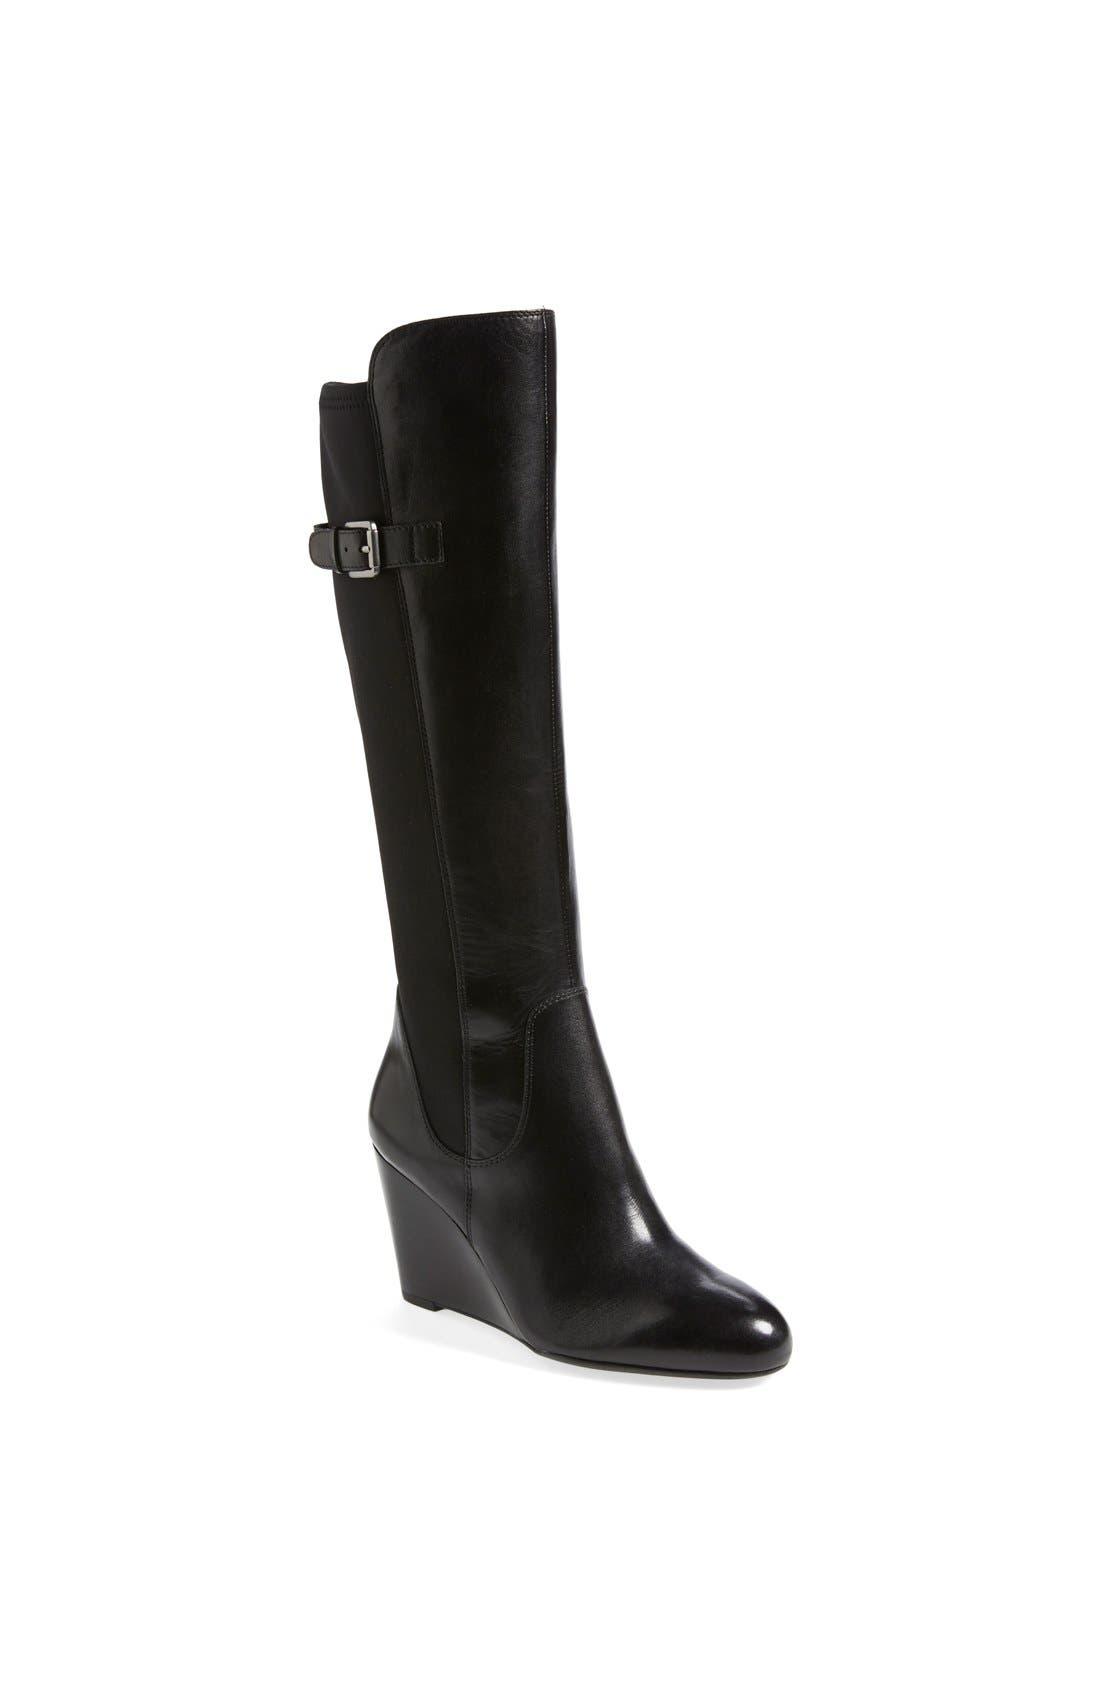 Alternate Image 1 Selected - Franco Sarto 'Obelisk' Knee High Wedge Boot (Online Only) (Women)